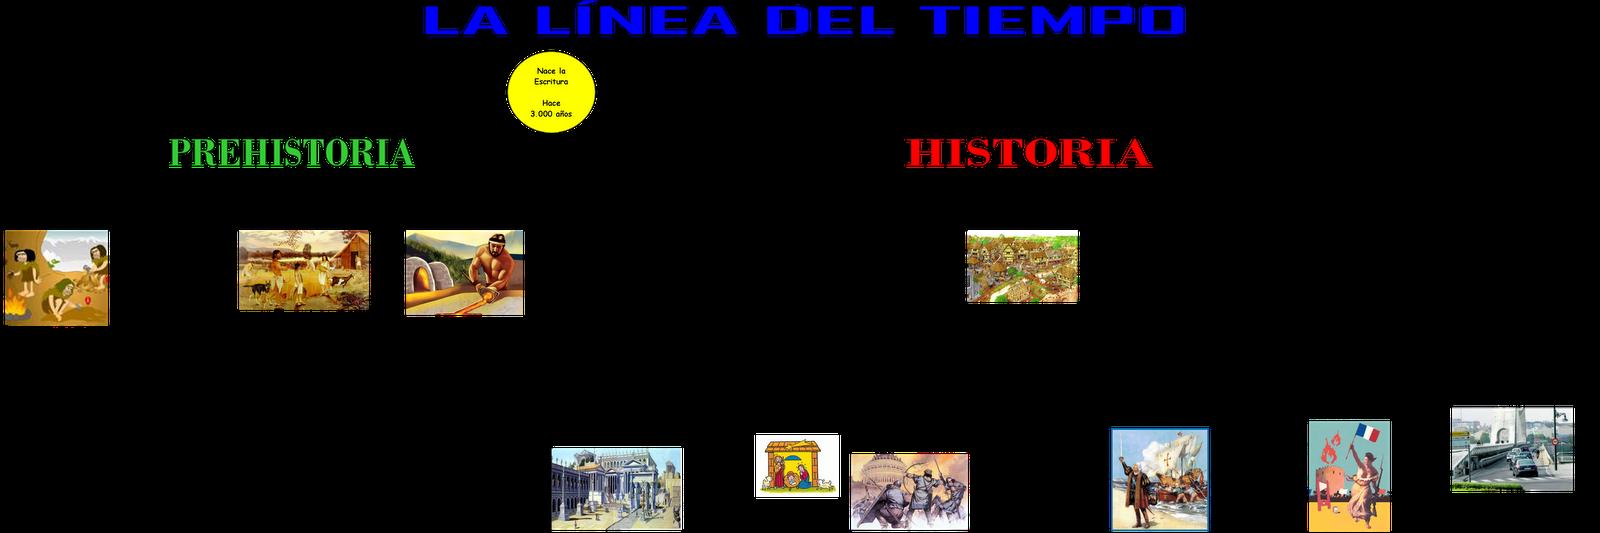 Numero De Ruta Banca Oriental:Linea Del Tiempo Historia